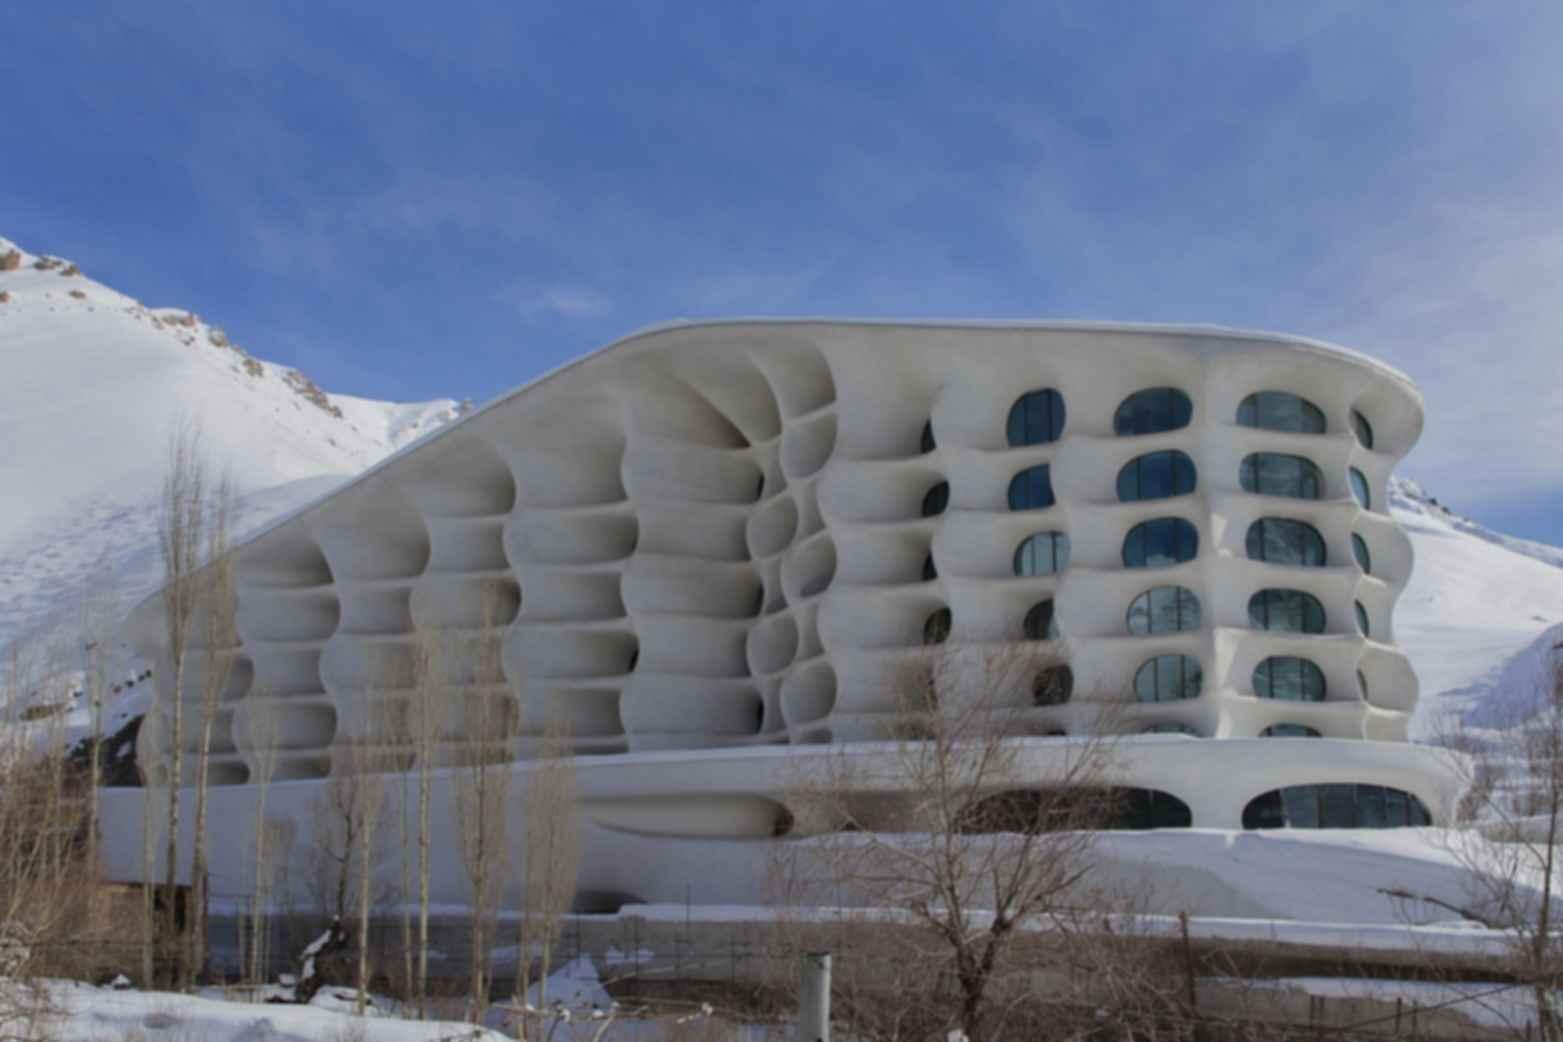 Barin Ski Resort - Exterior/Landscape